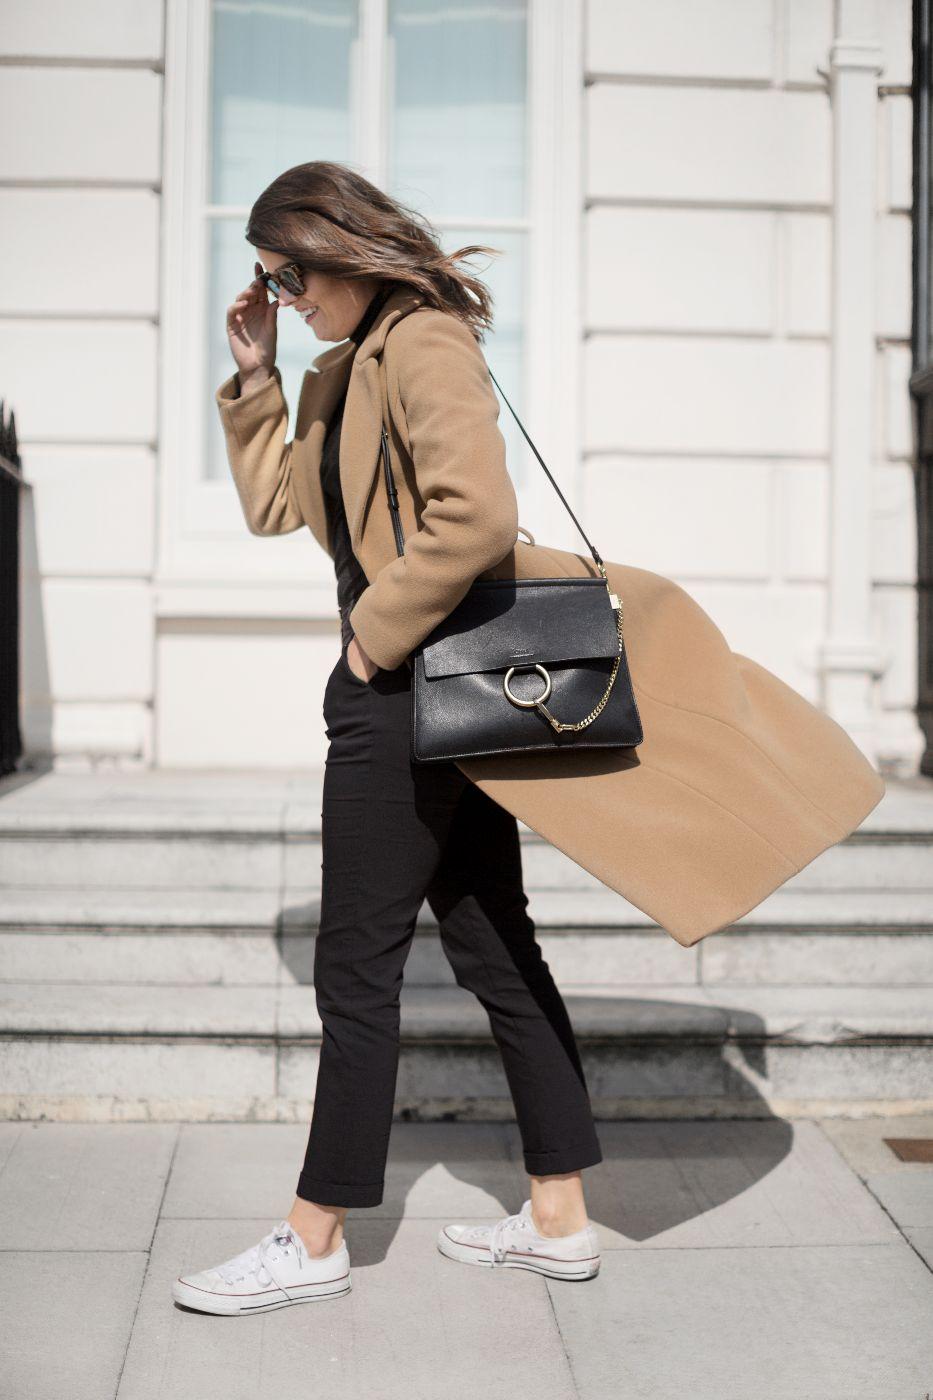 theannaedit-new-autumn-winter-coat-whistles-fashion-september-2017-11